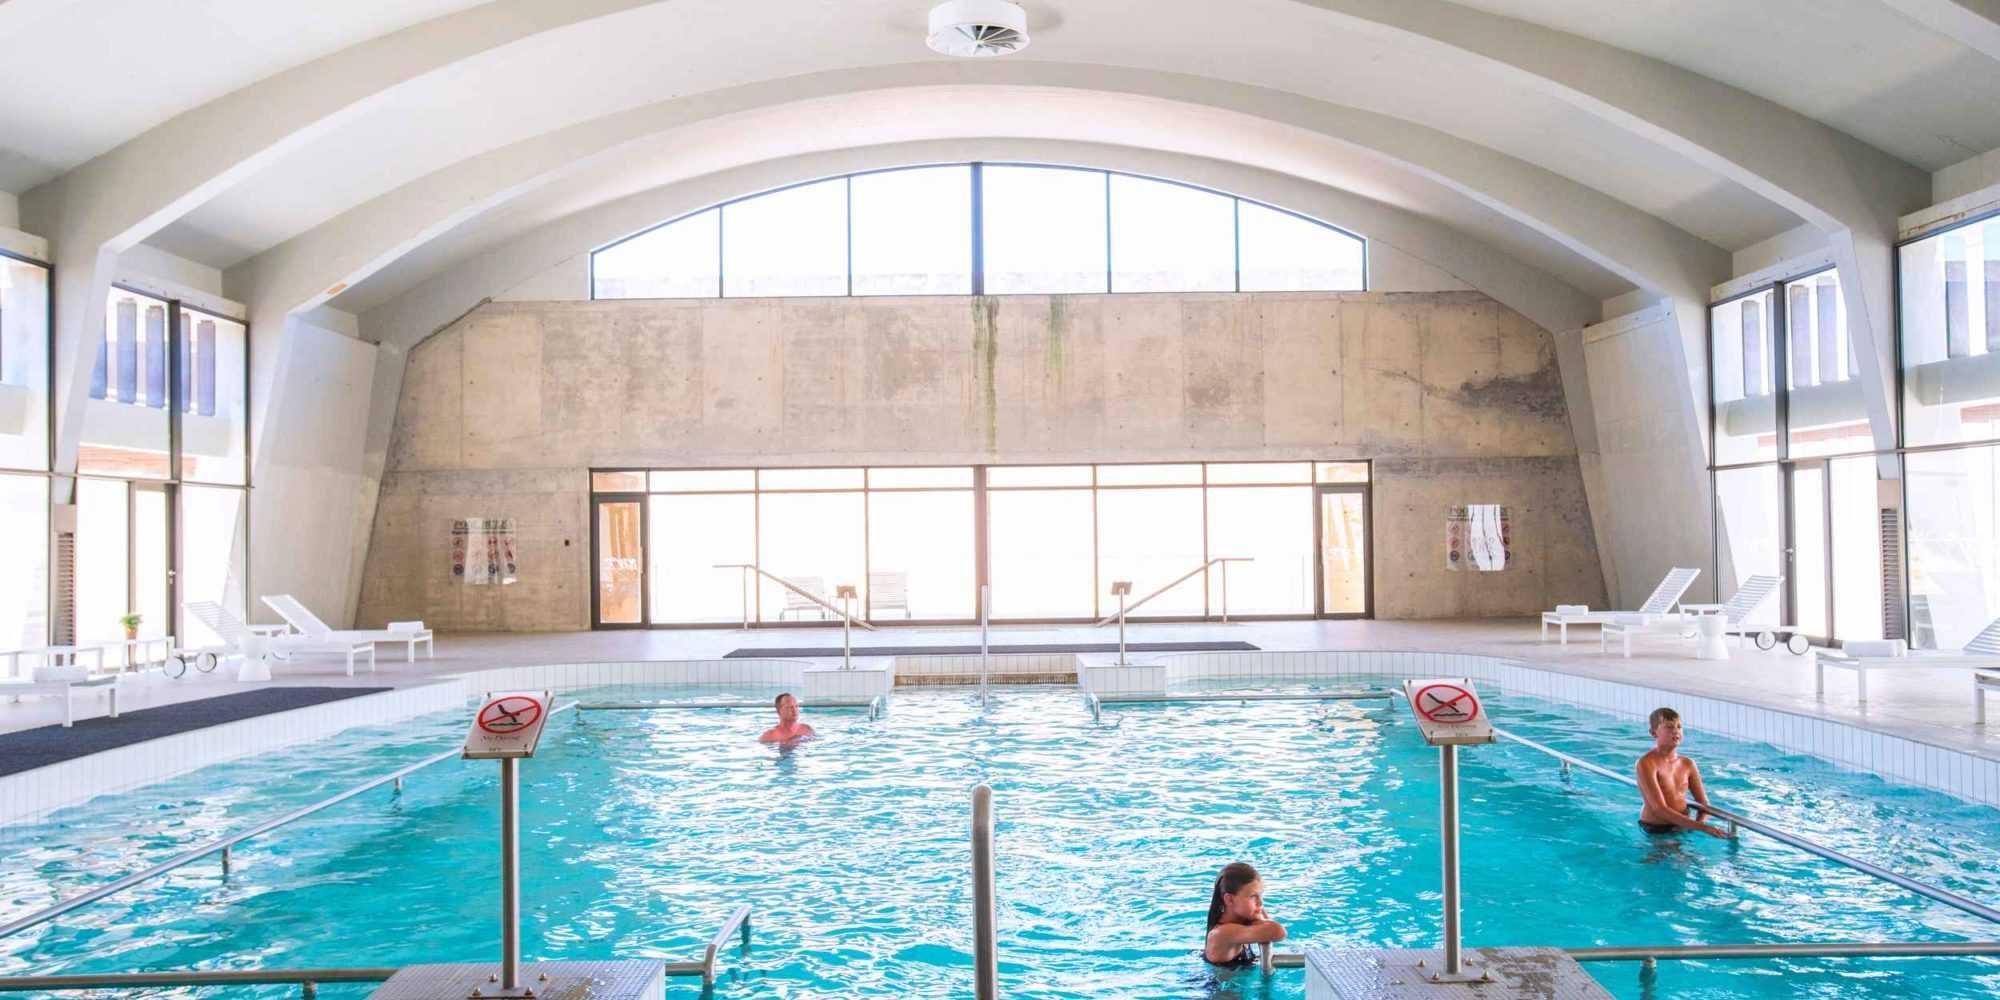 Gross Barmen Indoor Pool 11 © NWR 2018